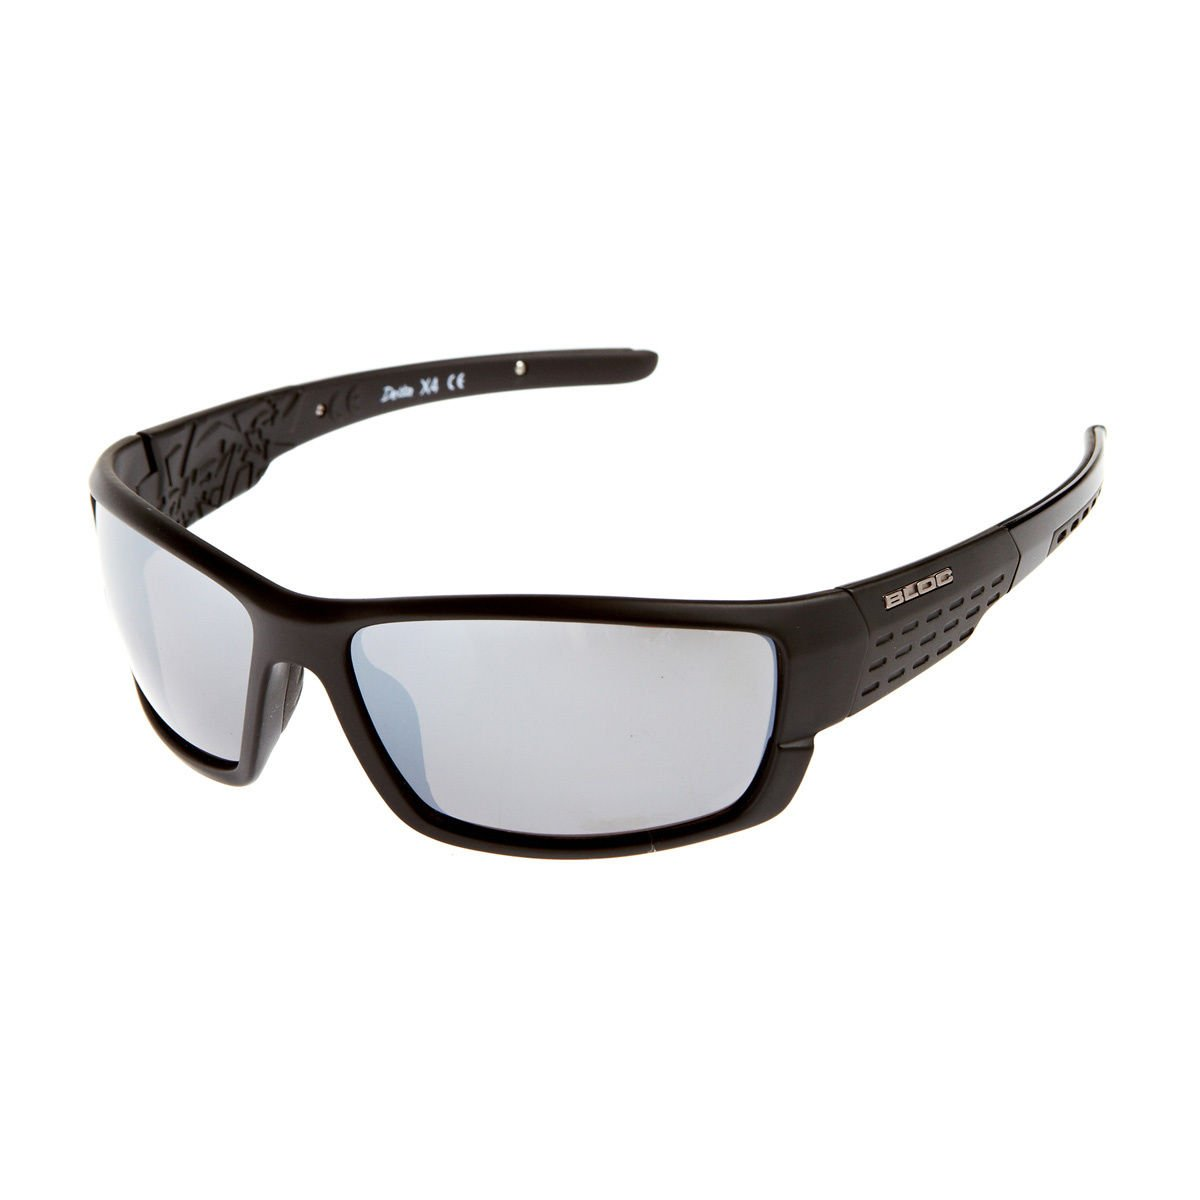 7761d9e9e8d Bloc Eyewear Men s Delta Sunglasses - Black  Amazon.co.uk  Sports   Outdoors